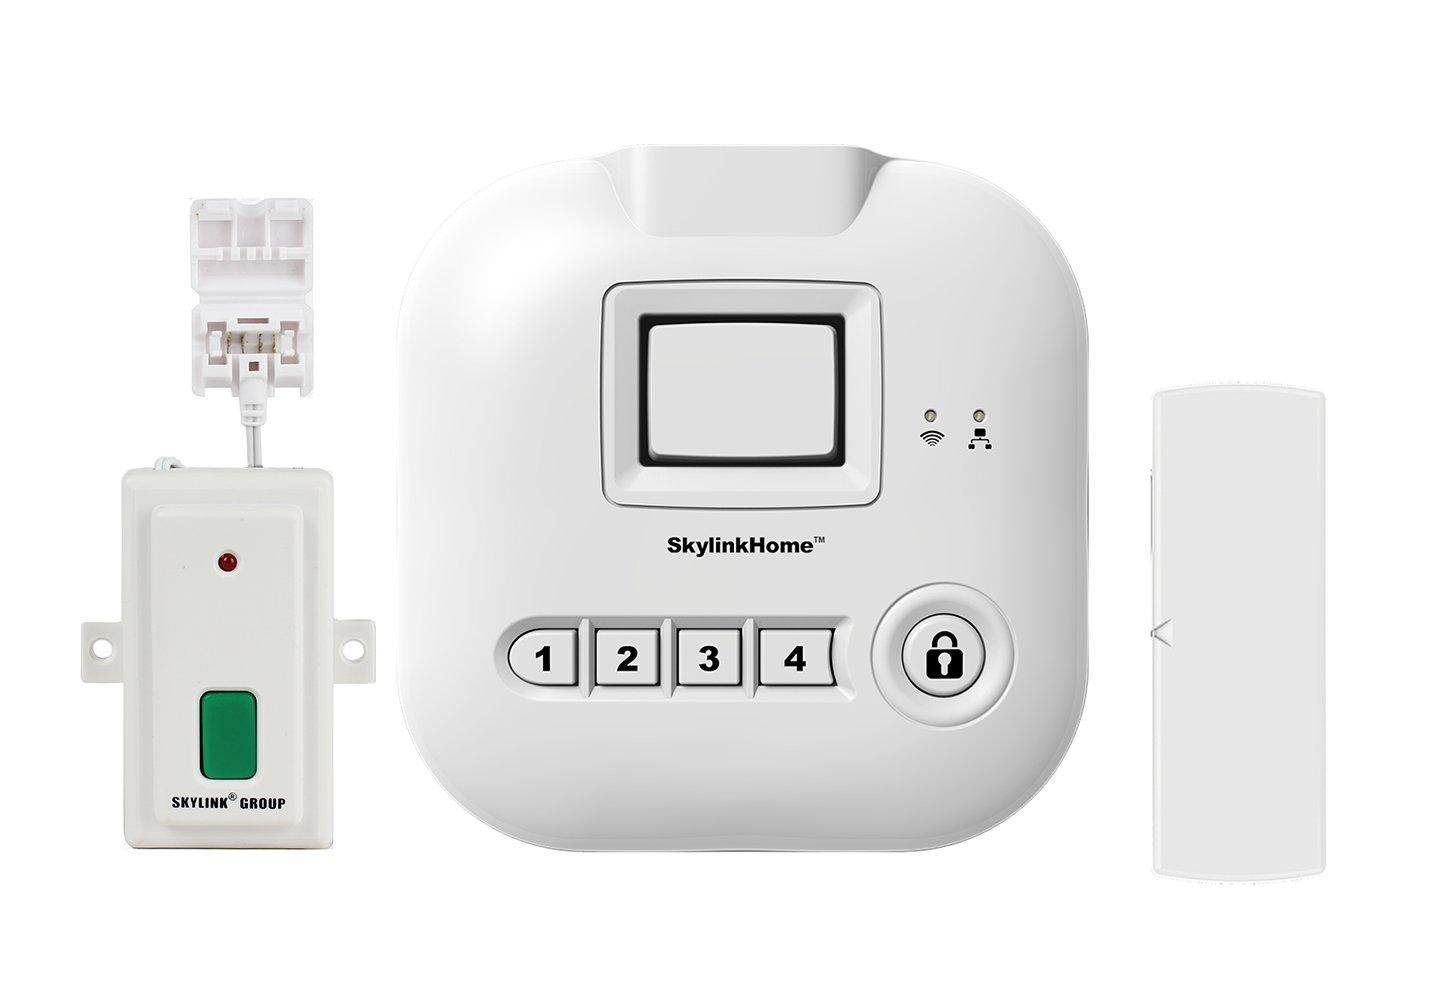 Skylink HU 100GBGS Universal Smartphone Garage Door Opener Monitor U0026  Control System     Amazon.com